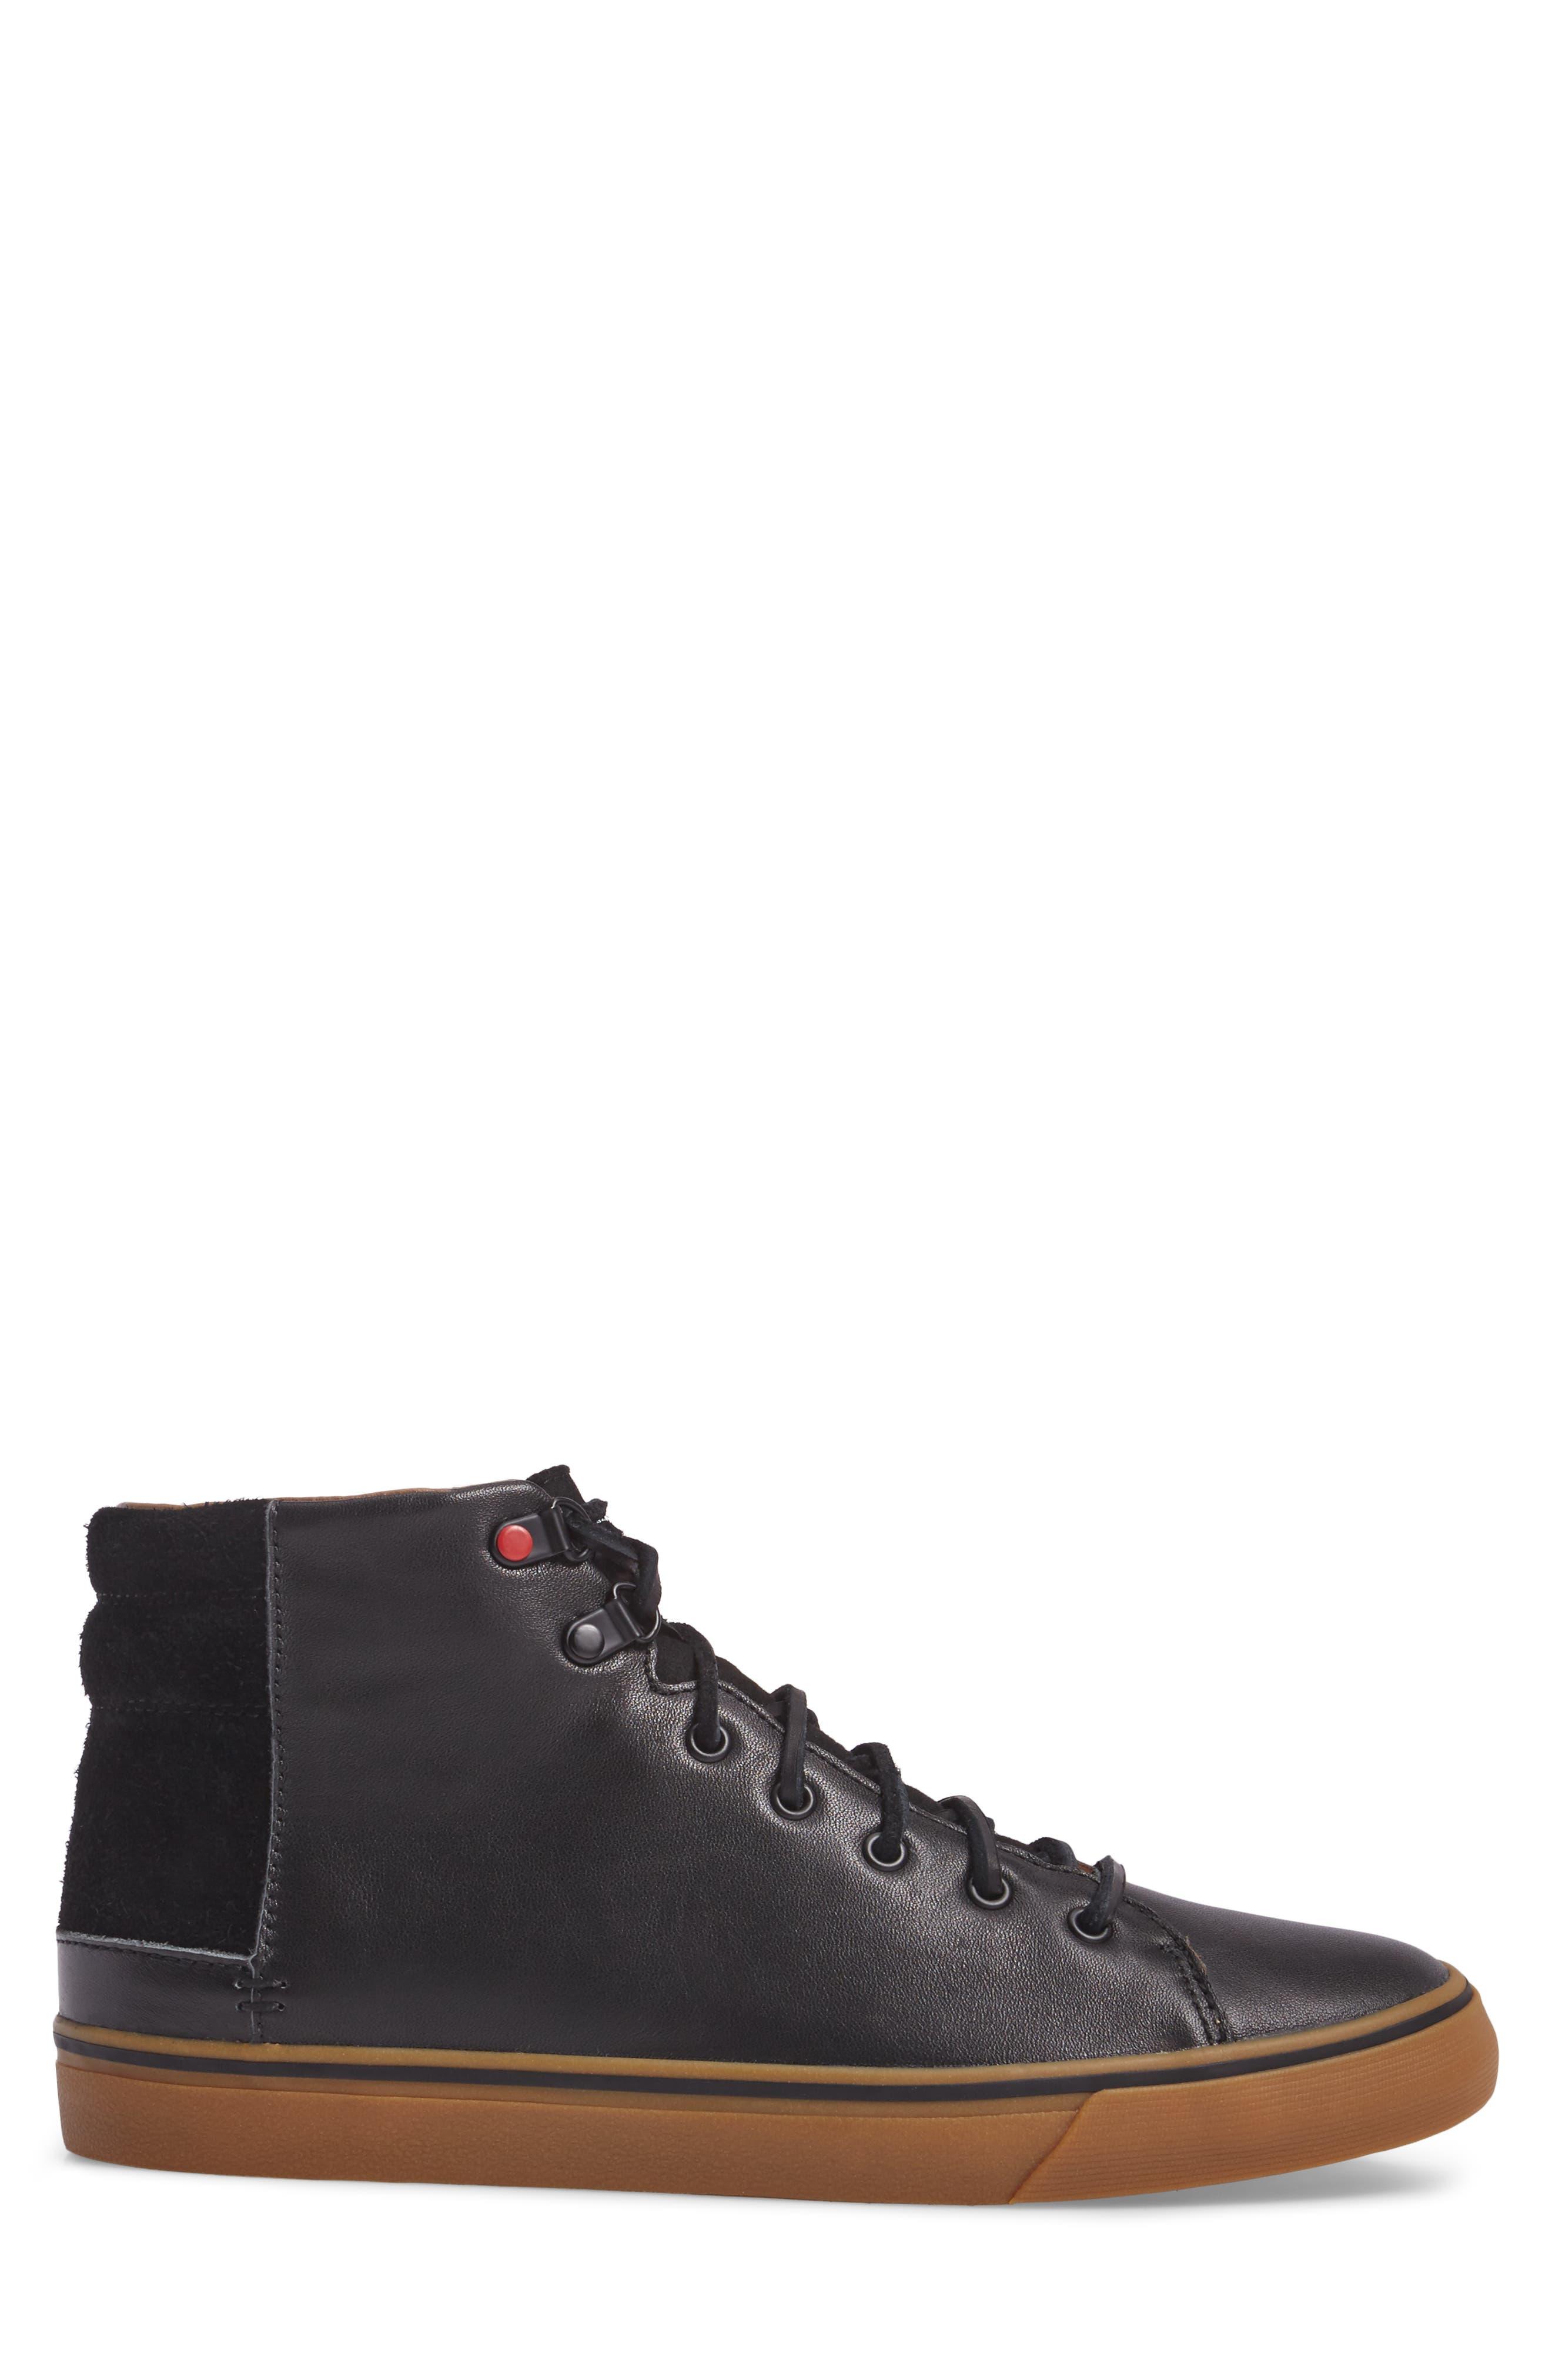 Alternate Image 3  - UGG® Hoyt Luxe Genuine Shearling High Top Sneaker (Men)